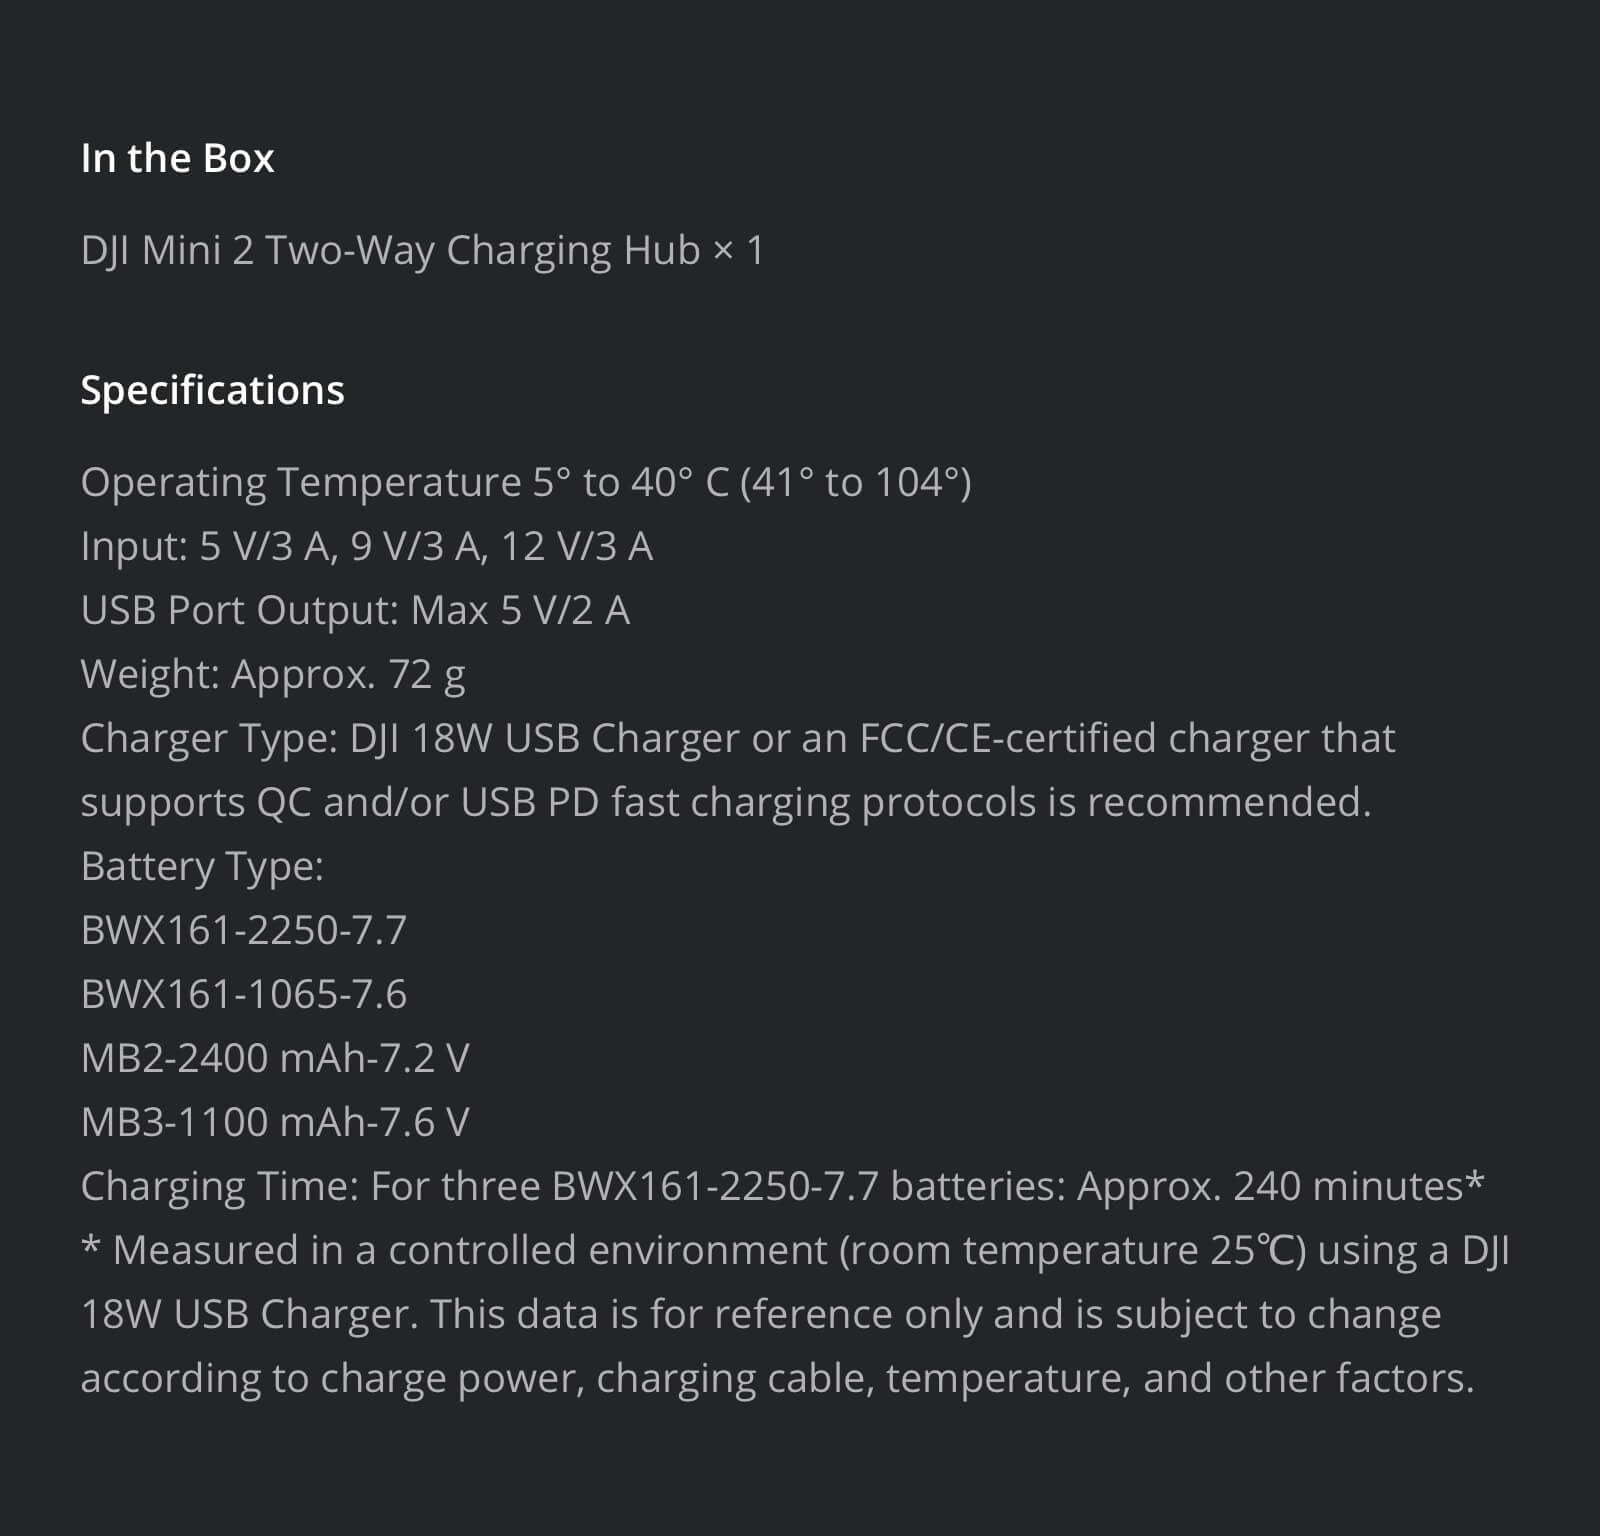 features.4 mini 2 2 way charging hub